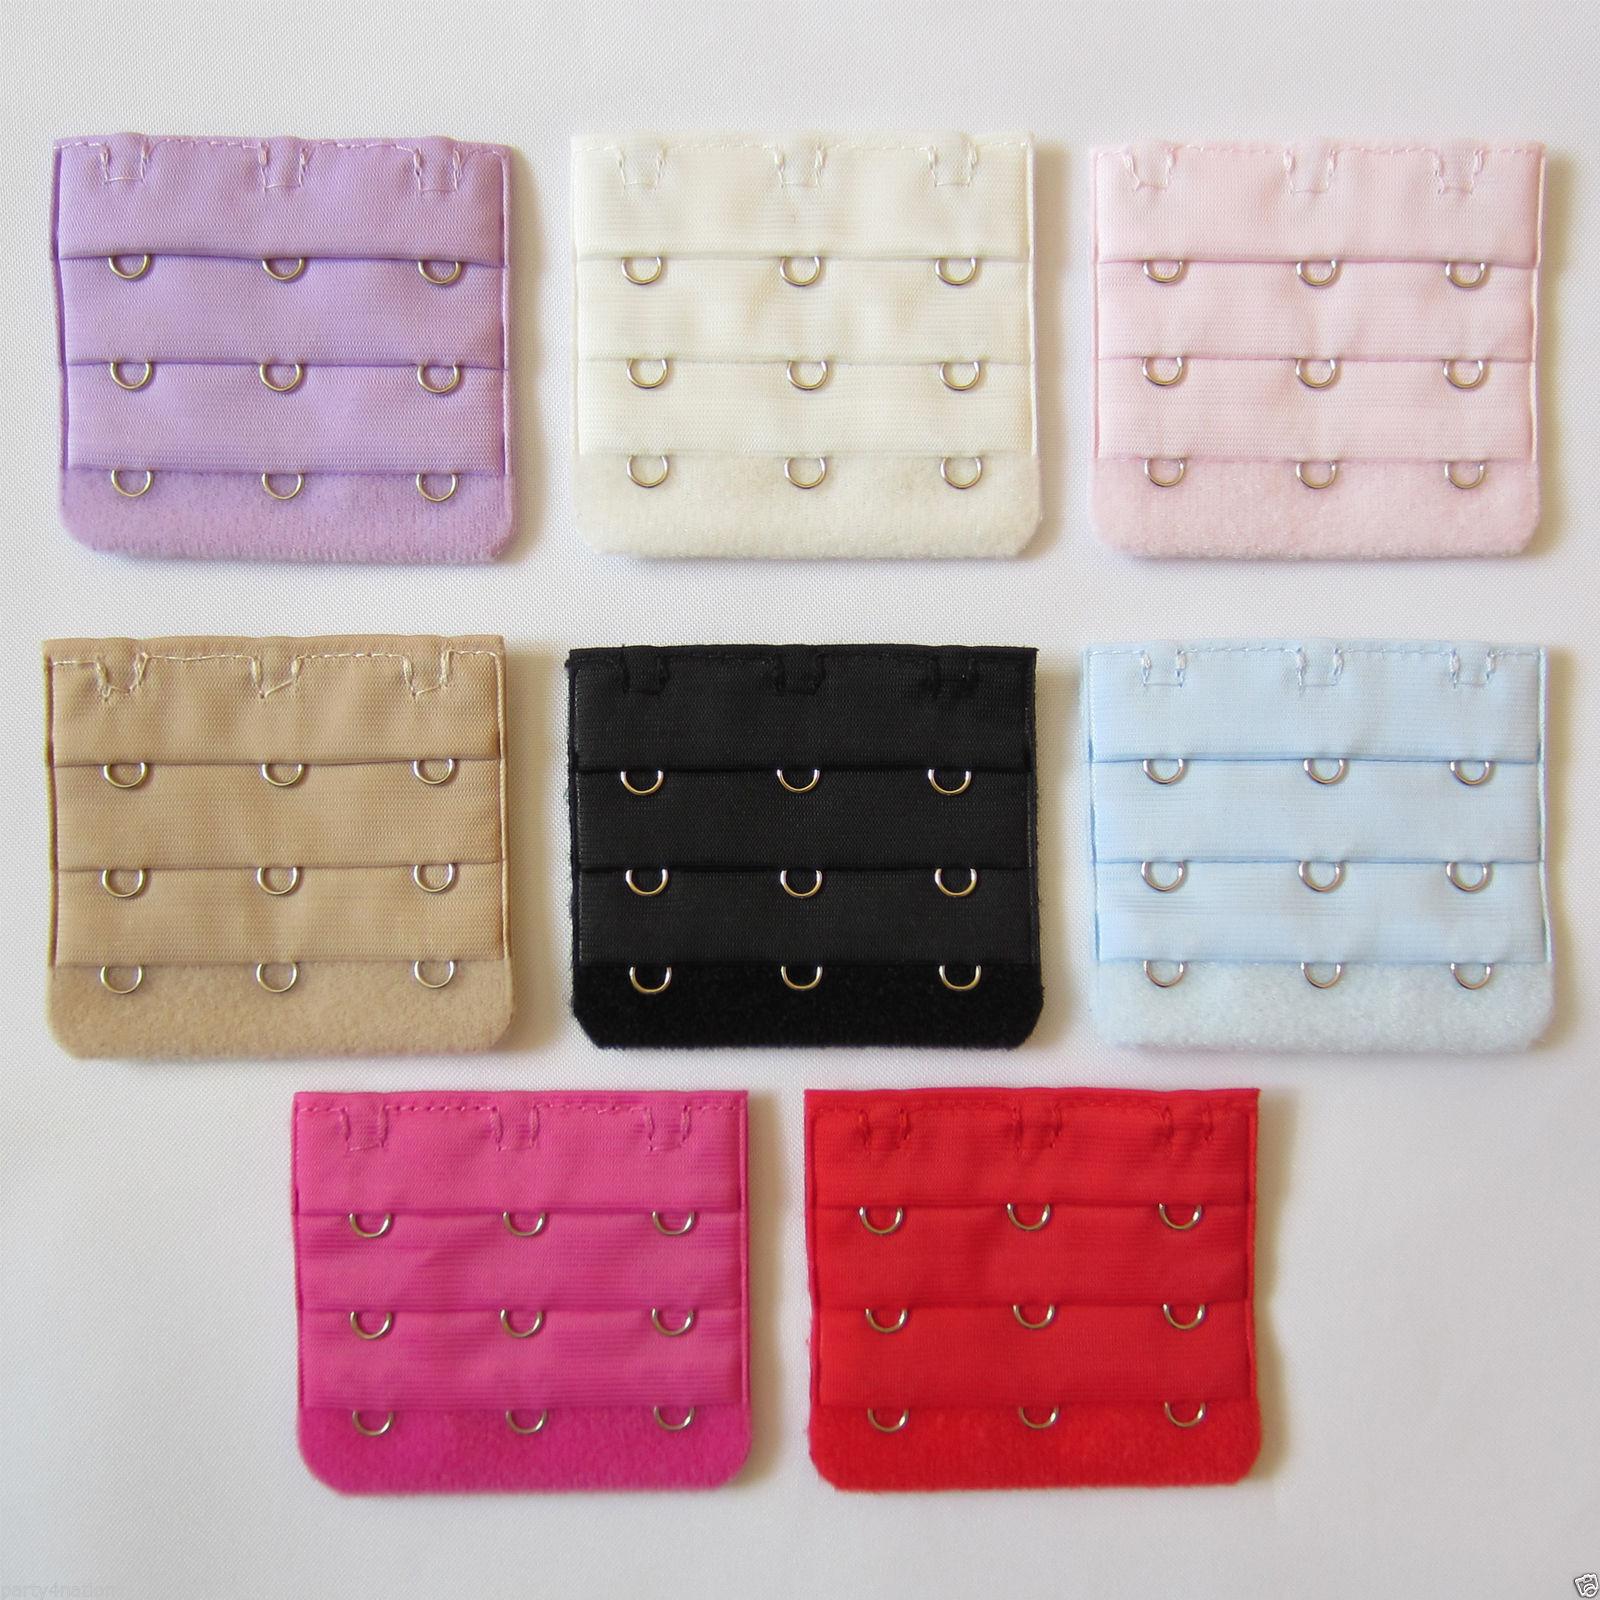 Ladies Bra Extender Bra Extension Strapless Underwear Strap 3Hooks (9 Colours)UK